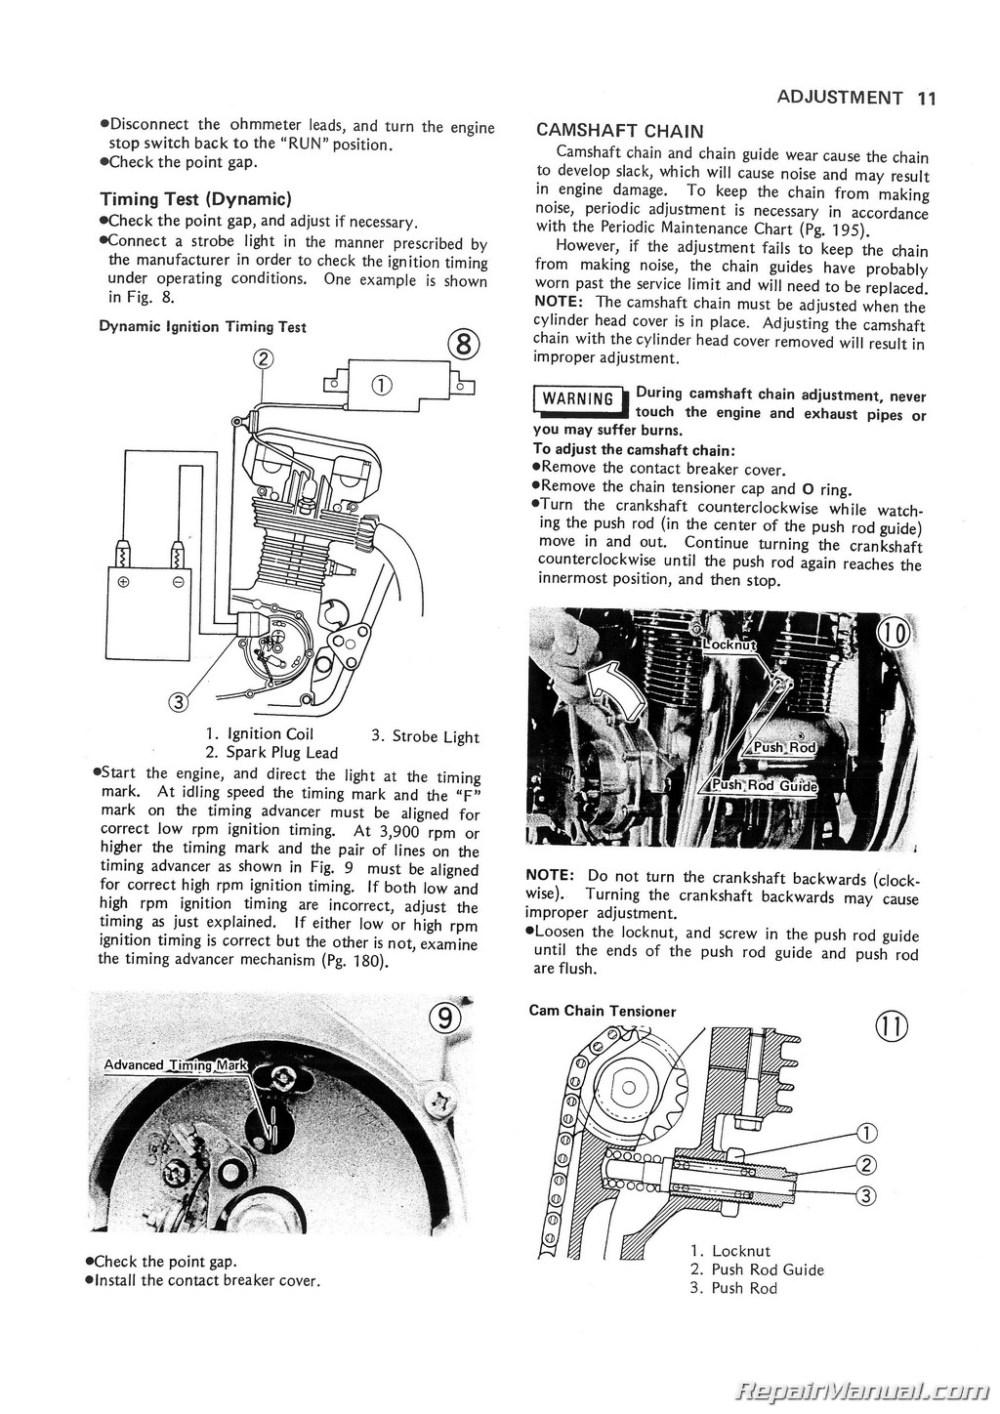 medium resolution of 1978 kawasaki 750 wiring diagram wiring diagram toolboxkawasaki kz750 wiring diagram wiring diagram centre 1978 kawasaki